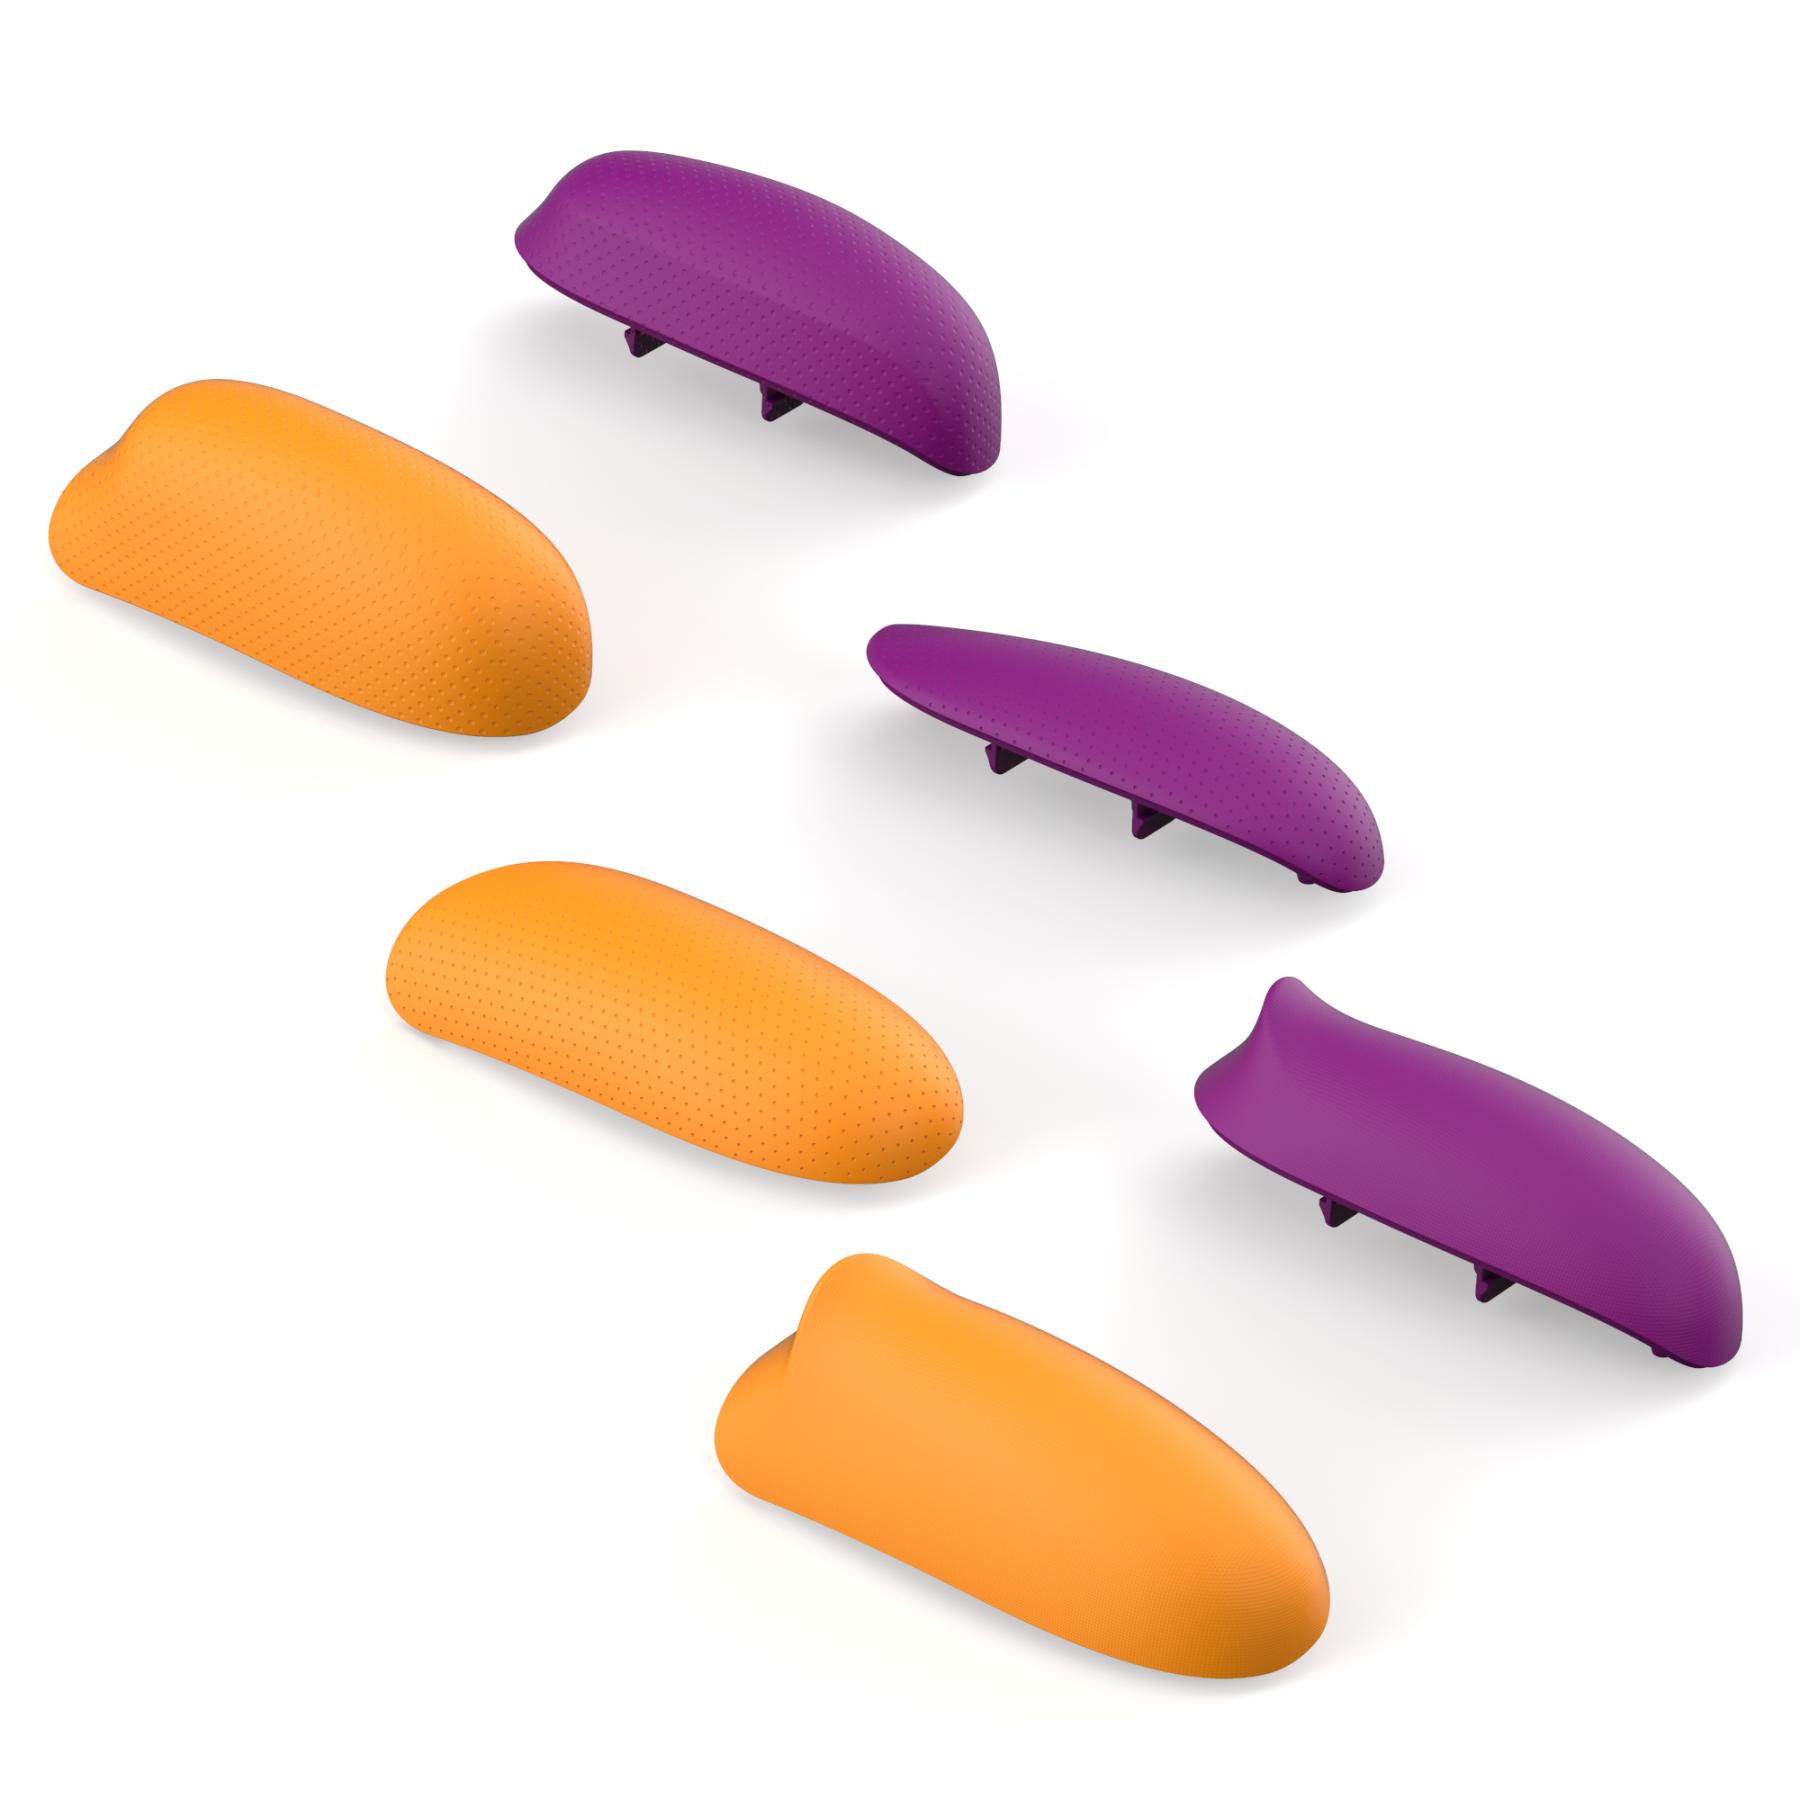 Змінні накладки-рукоятки Skull & Co. Grip Set For GripCase Neon Purple + Orange для SWITCH